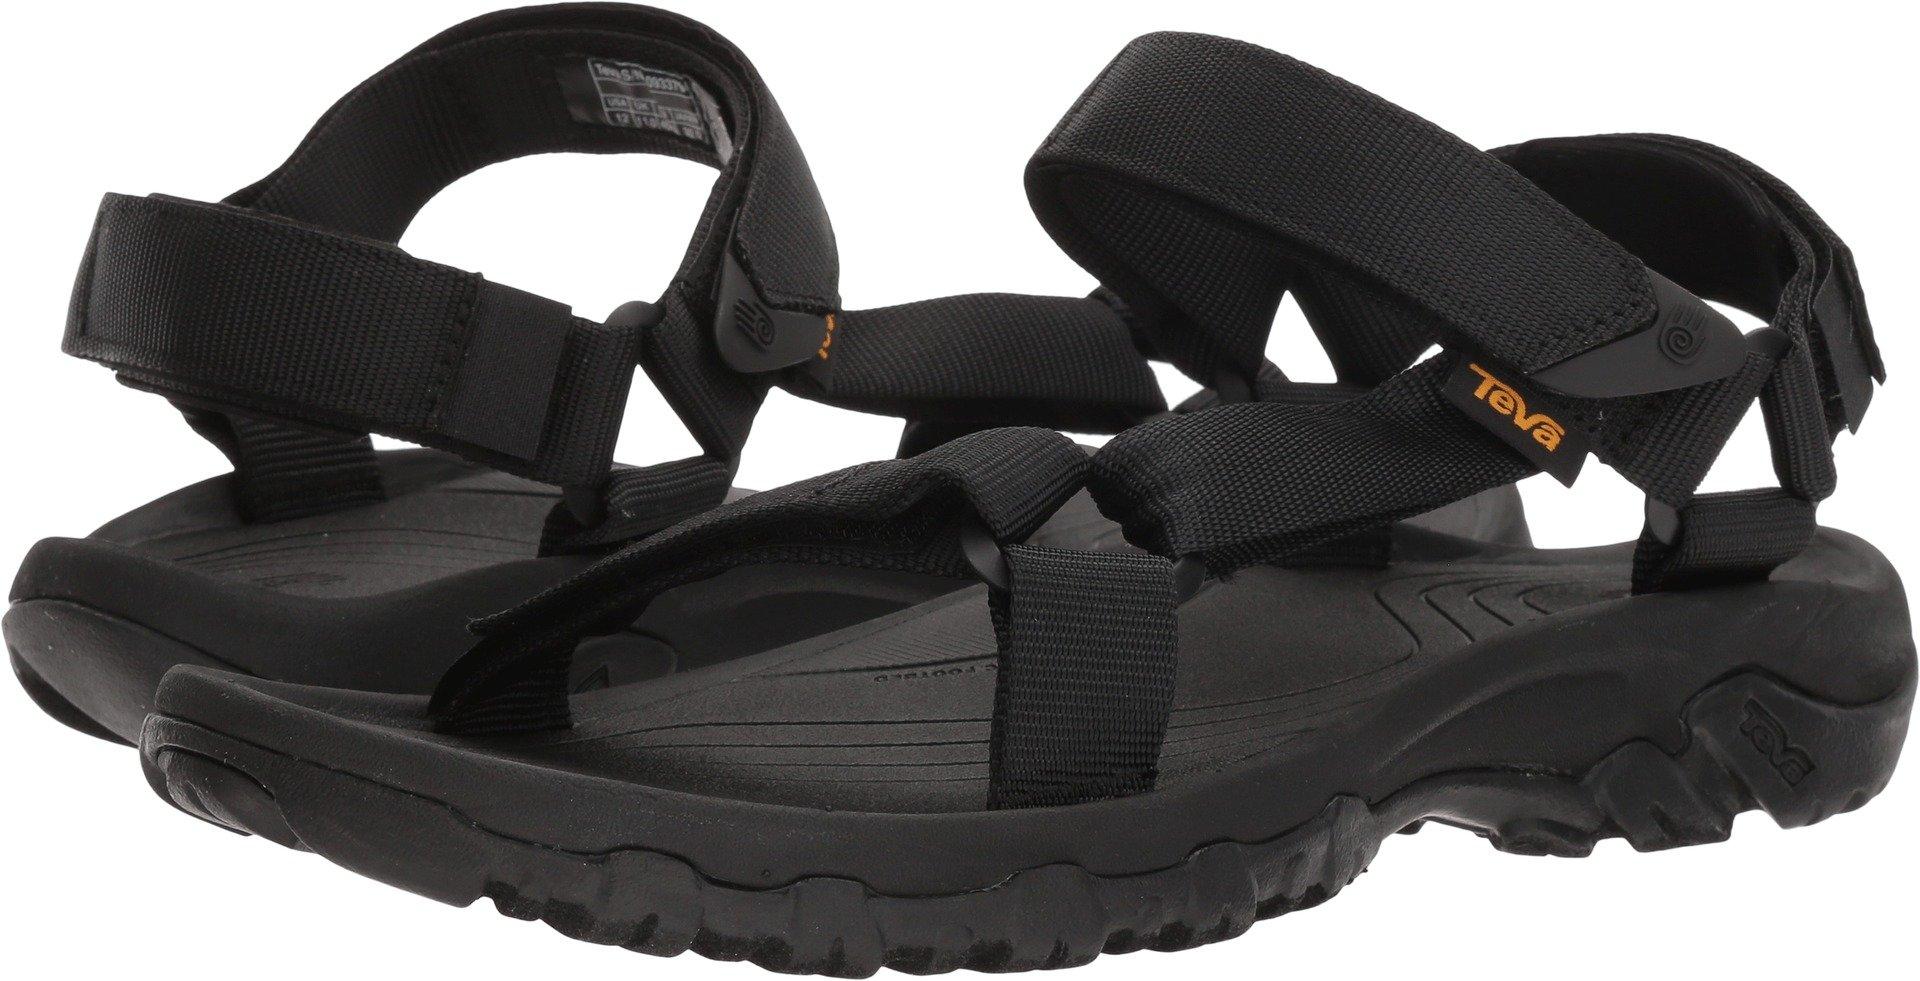 Teva Men's M Hurricane 4 Sport Sandal, Black, 13 M US